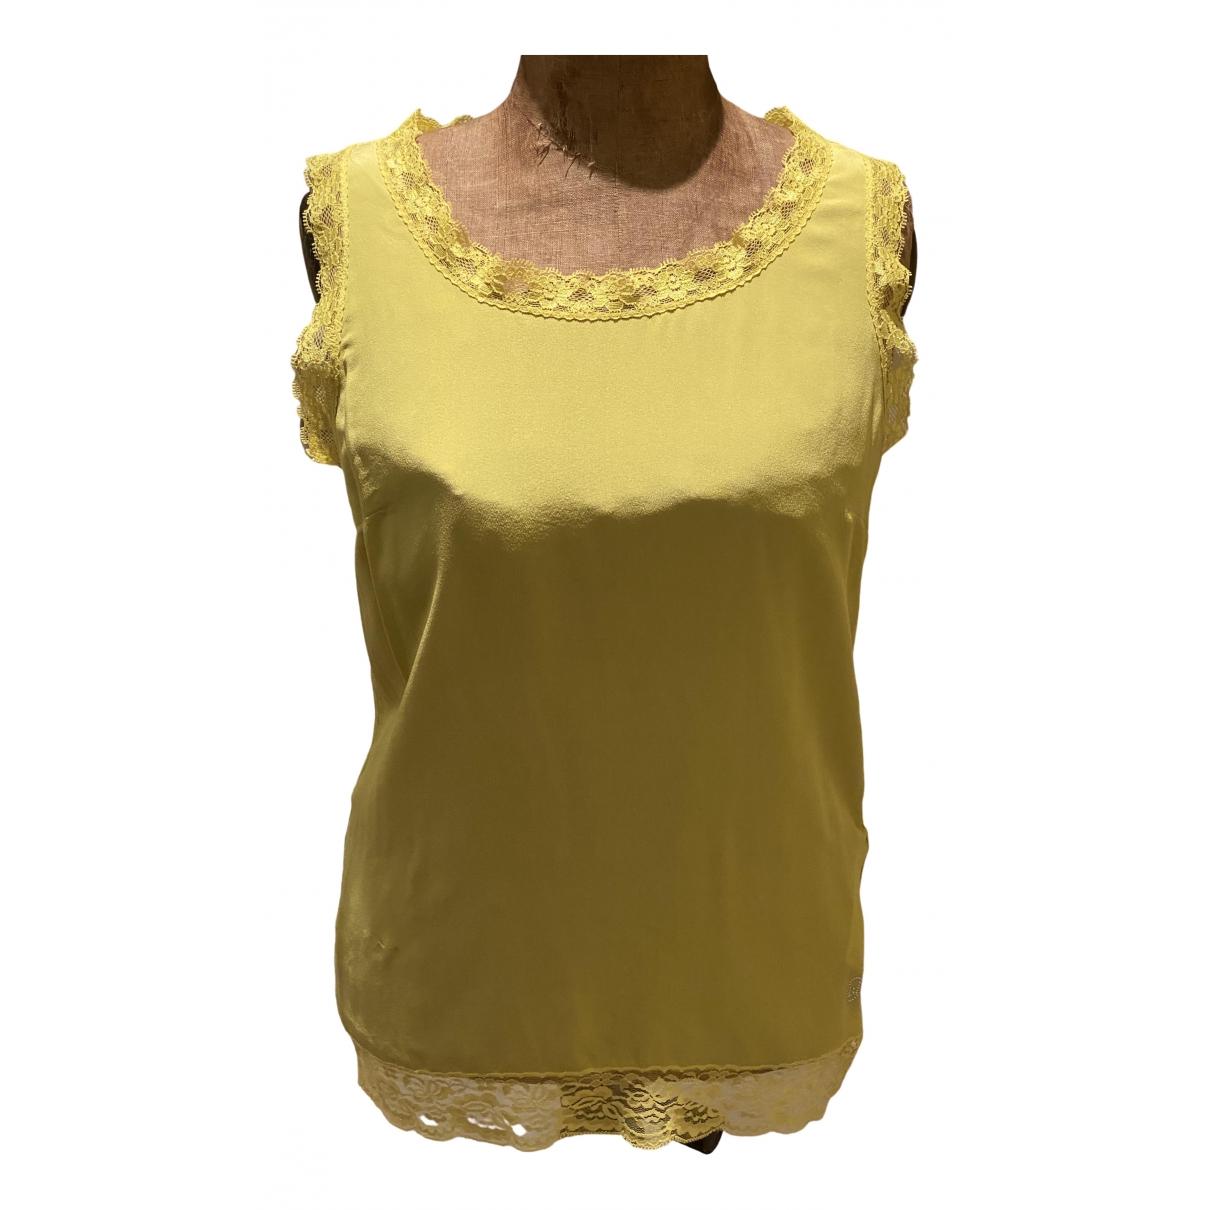 Liu.jo - Top   pour femme - jaune